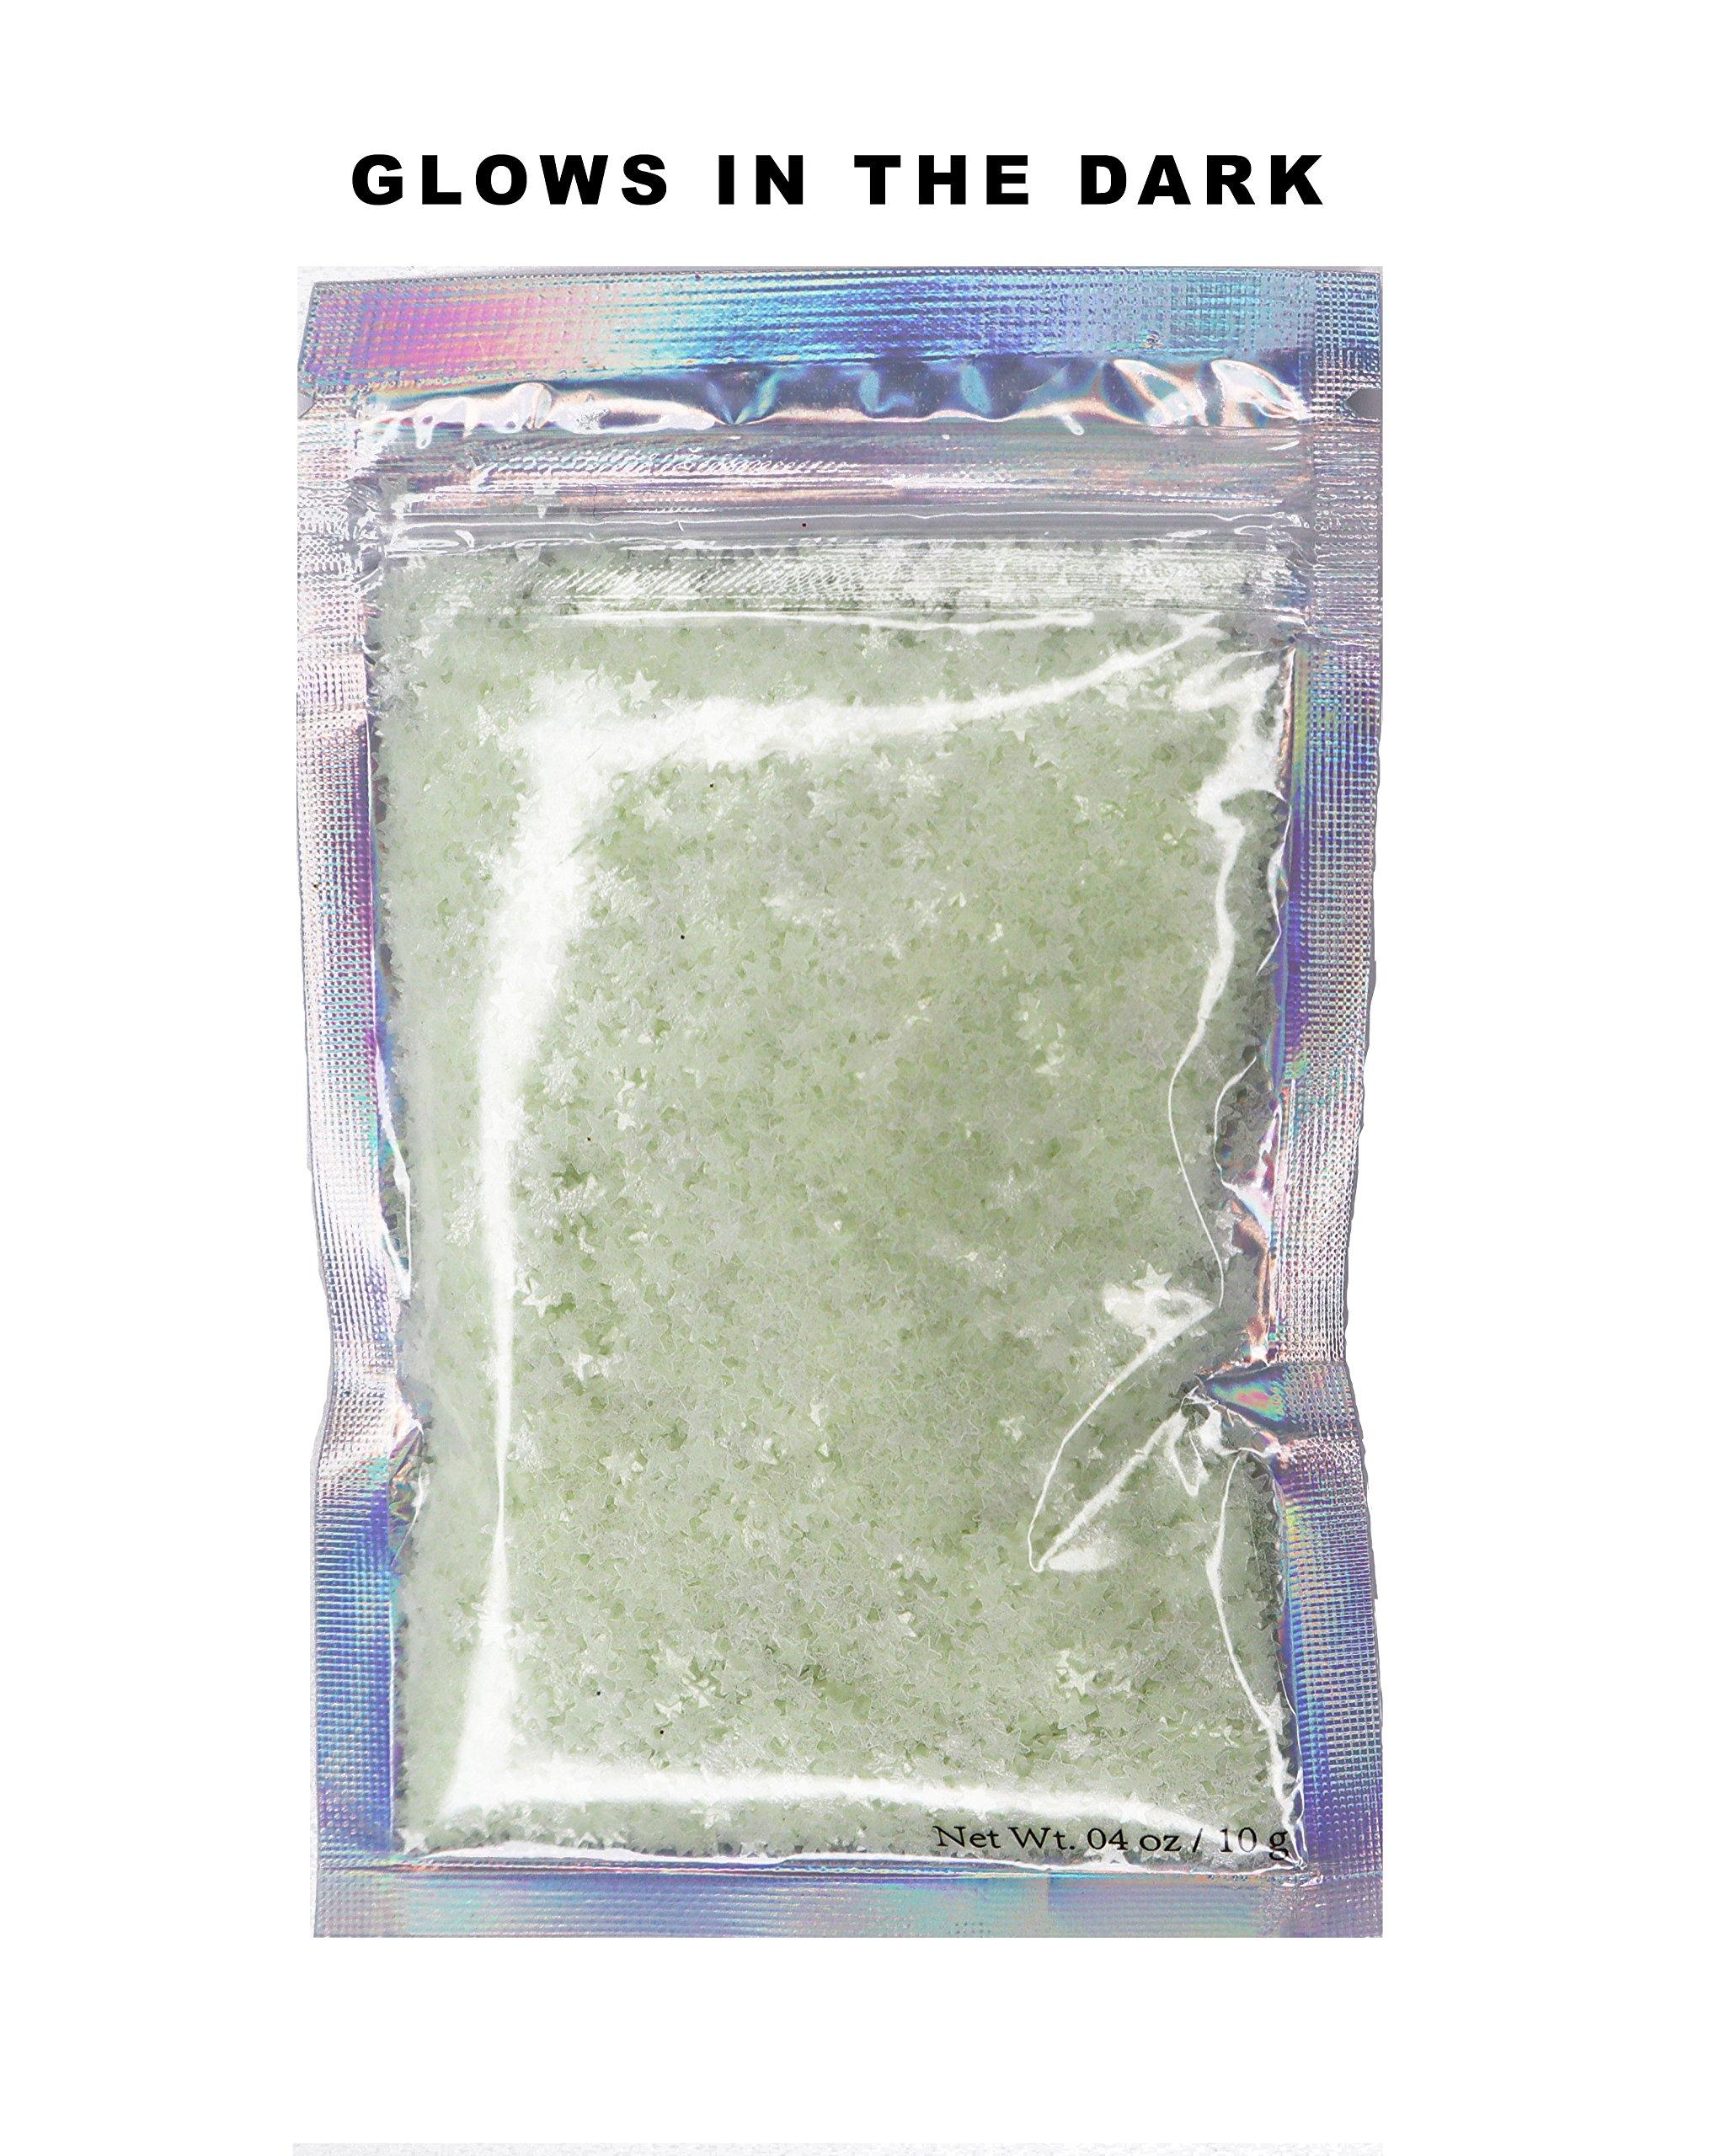 10 Grams ✮ Glow In The Dark UV Star Glitter ✮ COSMETIC GLITTER ✮ Festival Rave Beauty Makeup Face Body Nail ✮